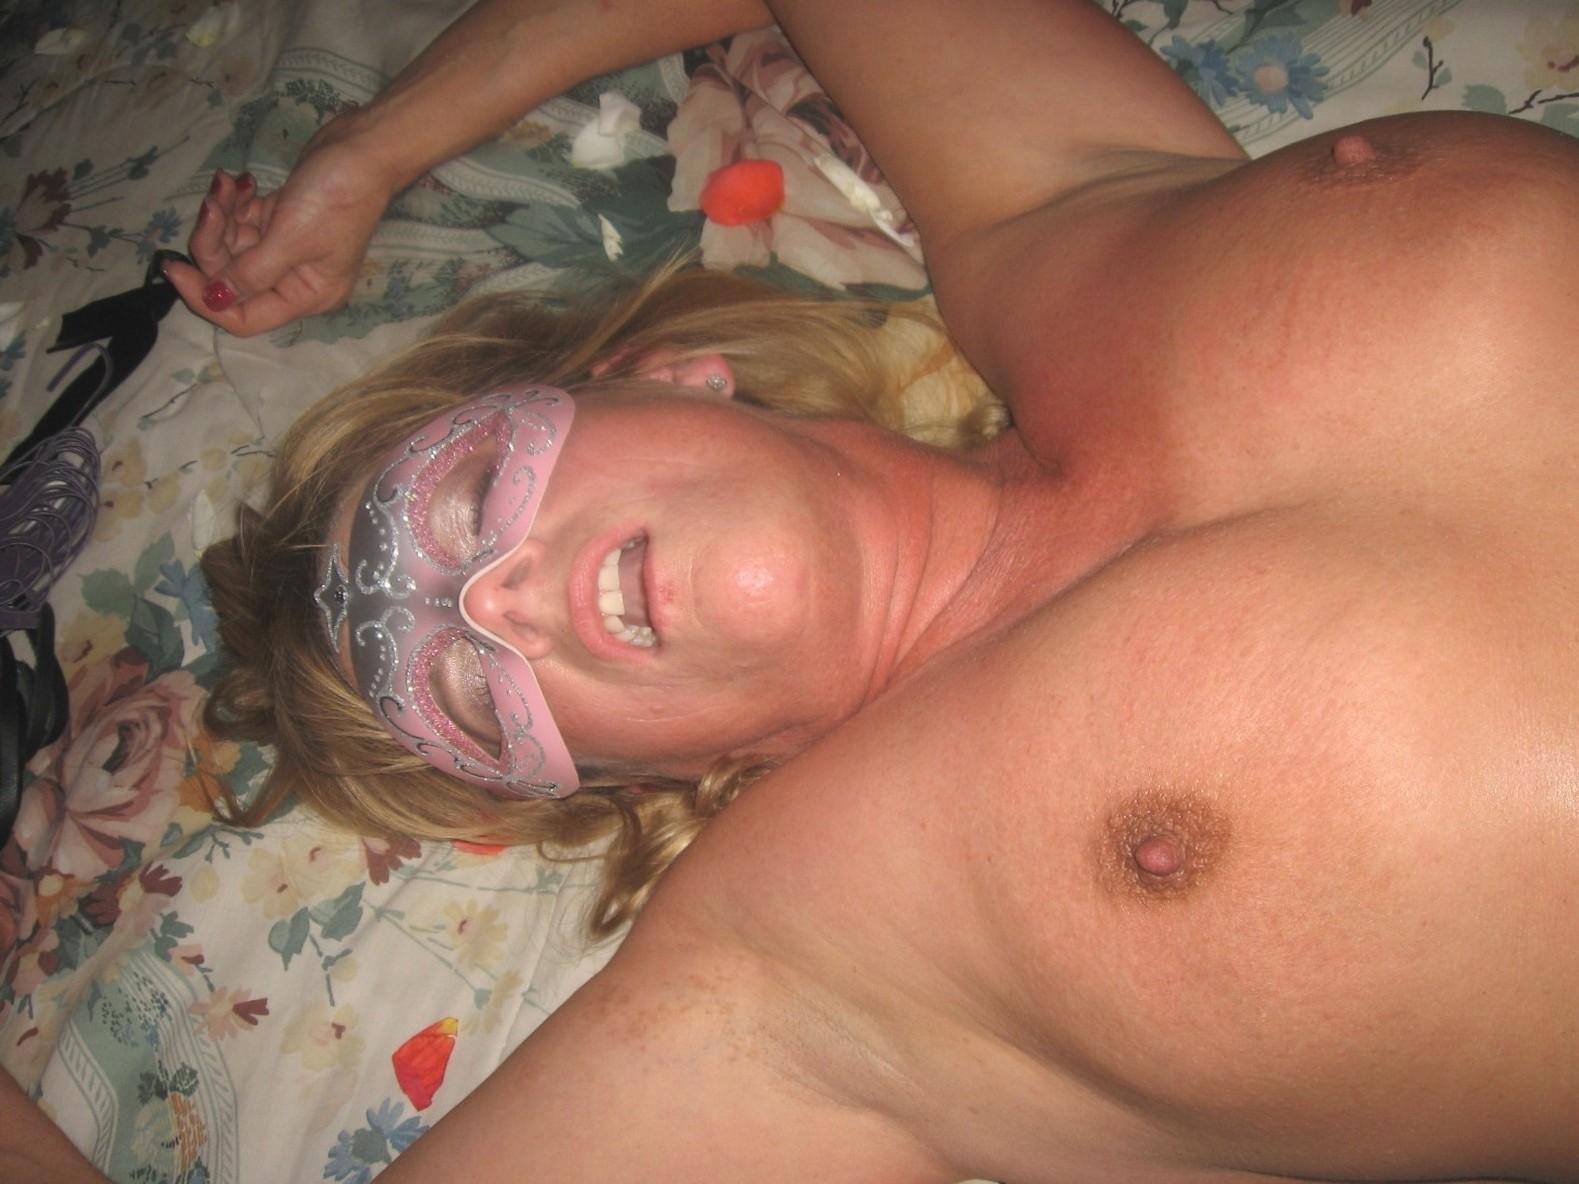 Jan,55 year old sub/slut..